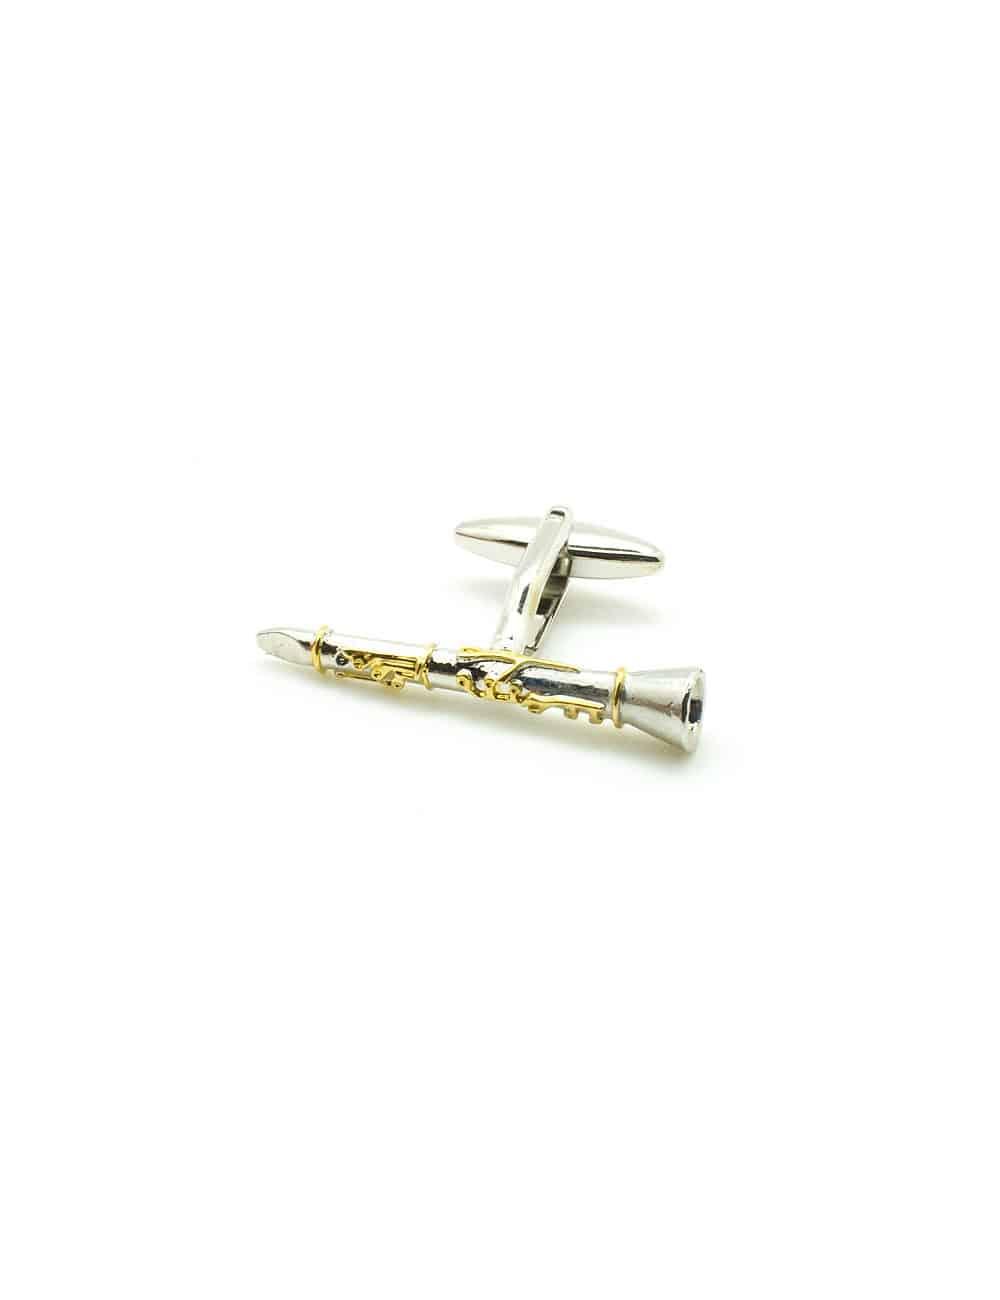 Silver Clarinet with Gold Details Cufflink C212NH-014